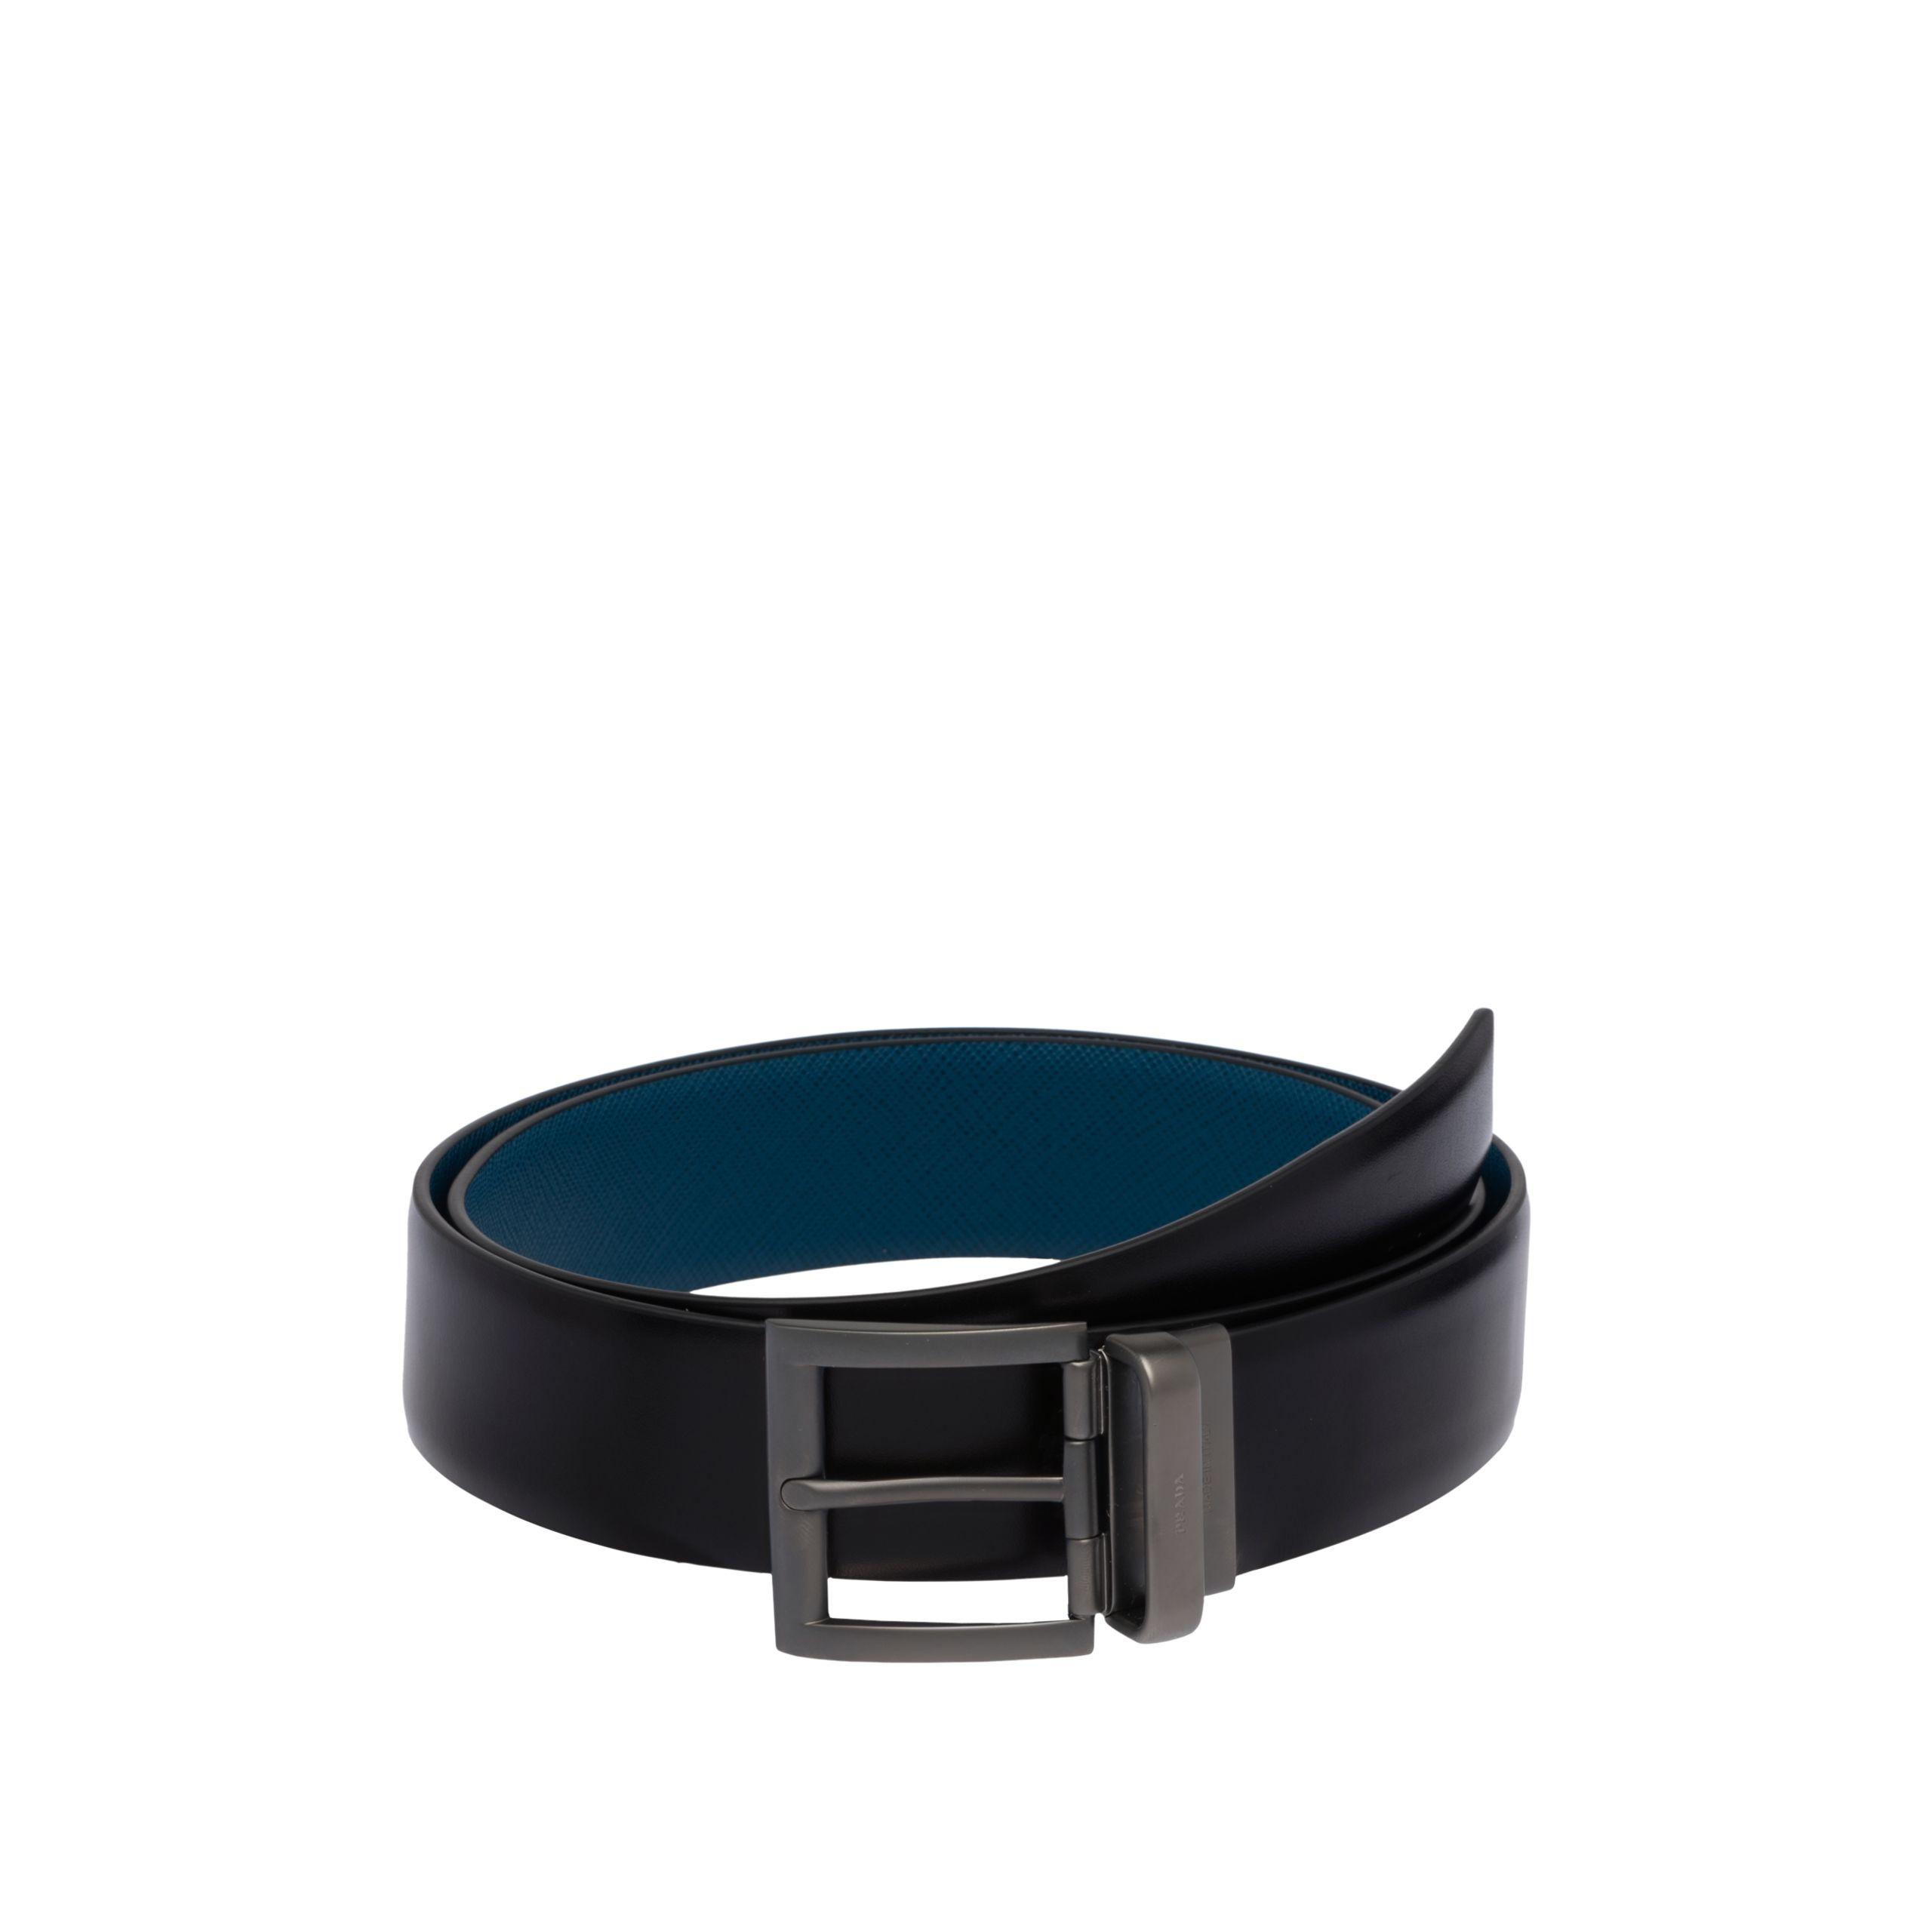 Belt Styles